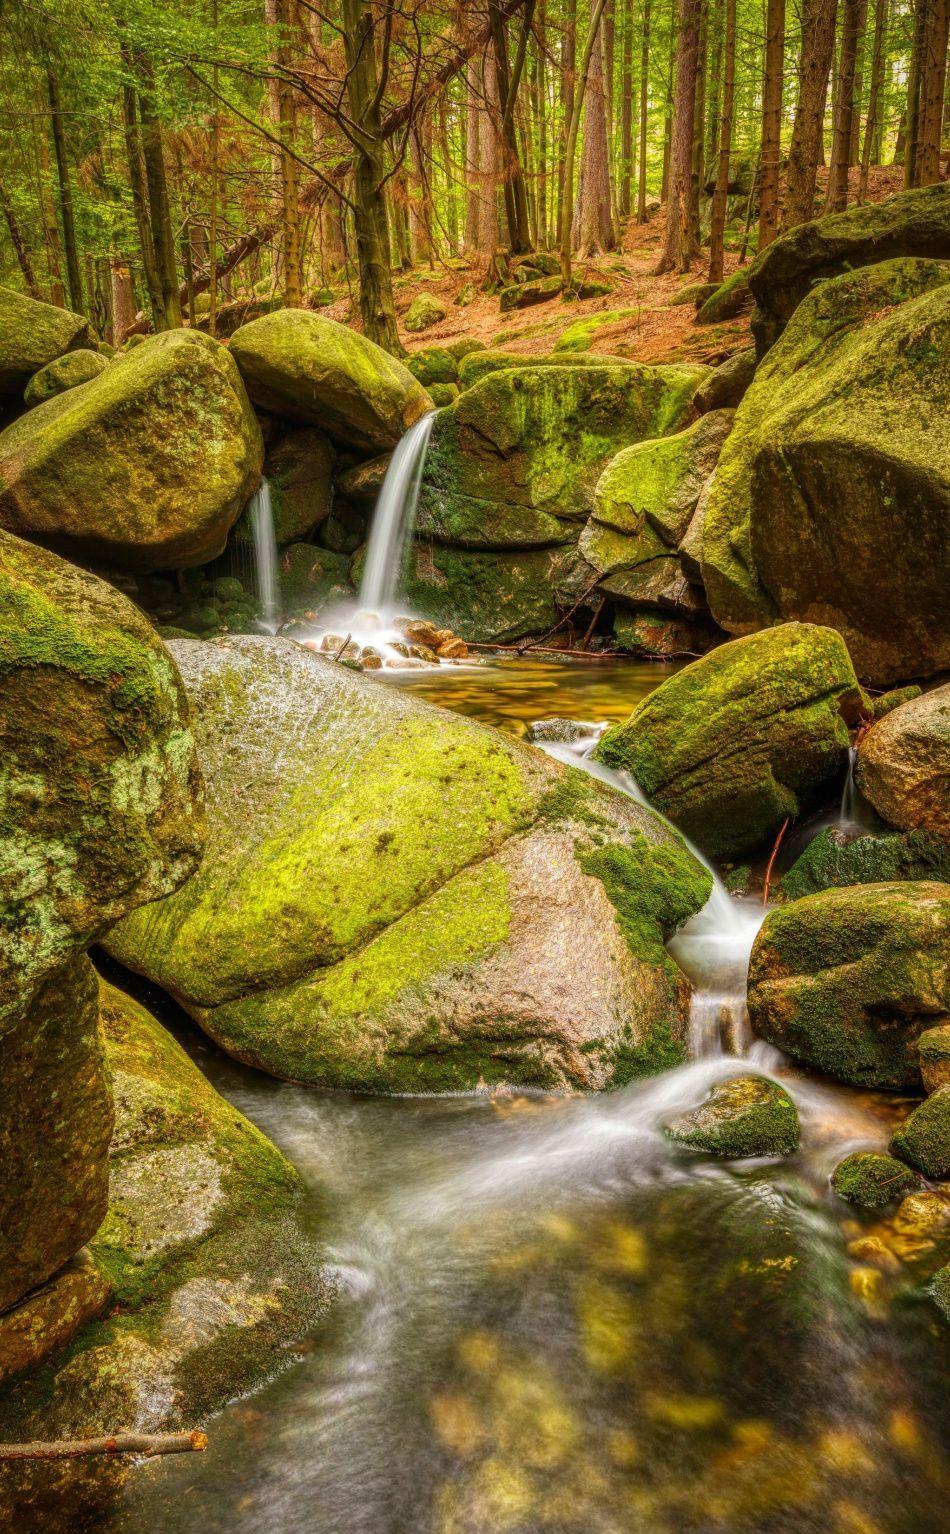 Water Stream Forest Rocks Nature Wallpaper Nature Wallpaper Nature Images Hd Nature Wallpapers